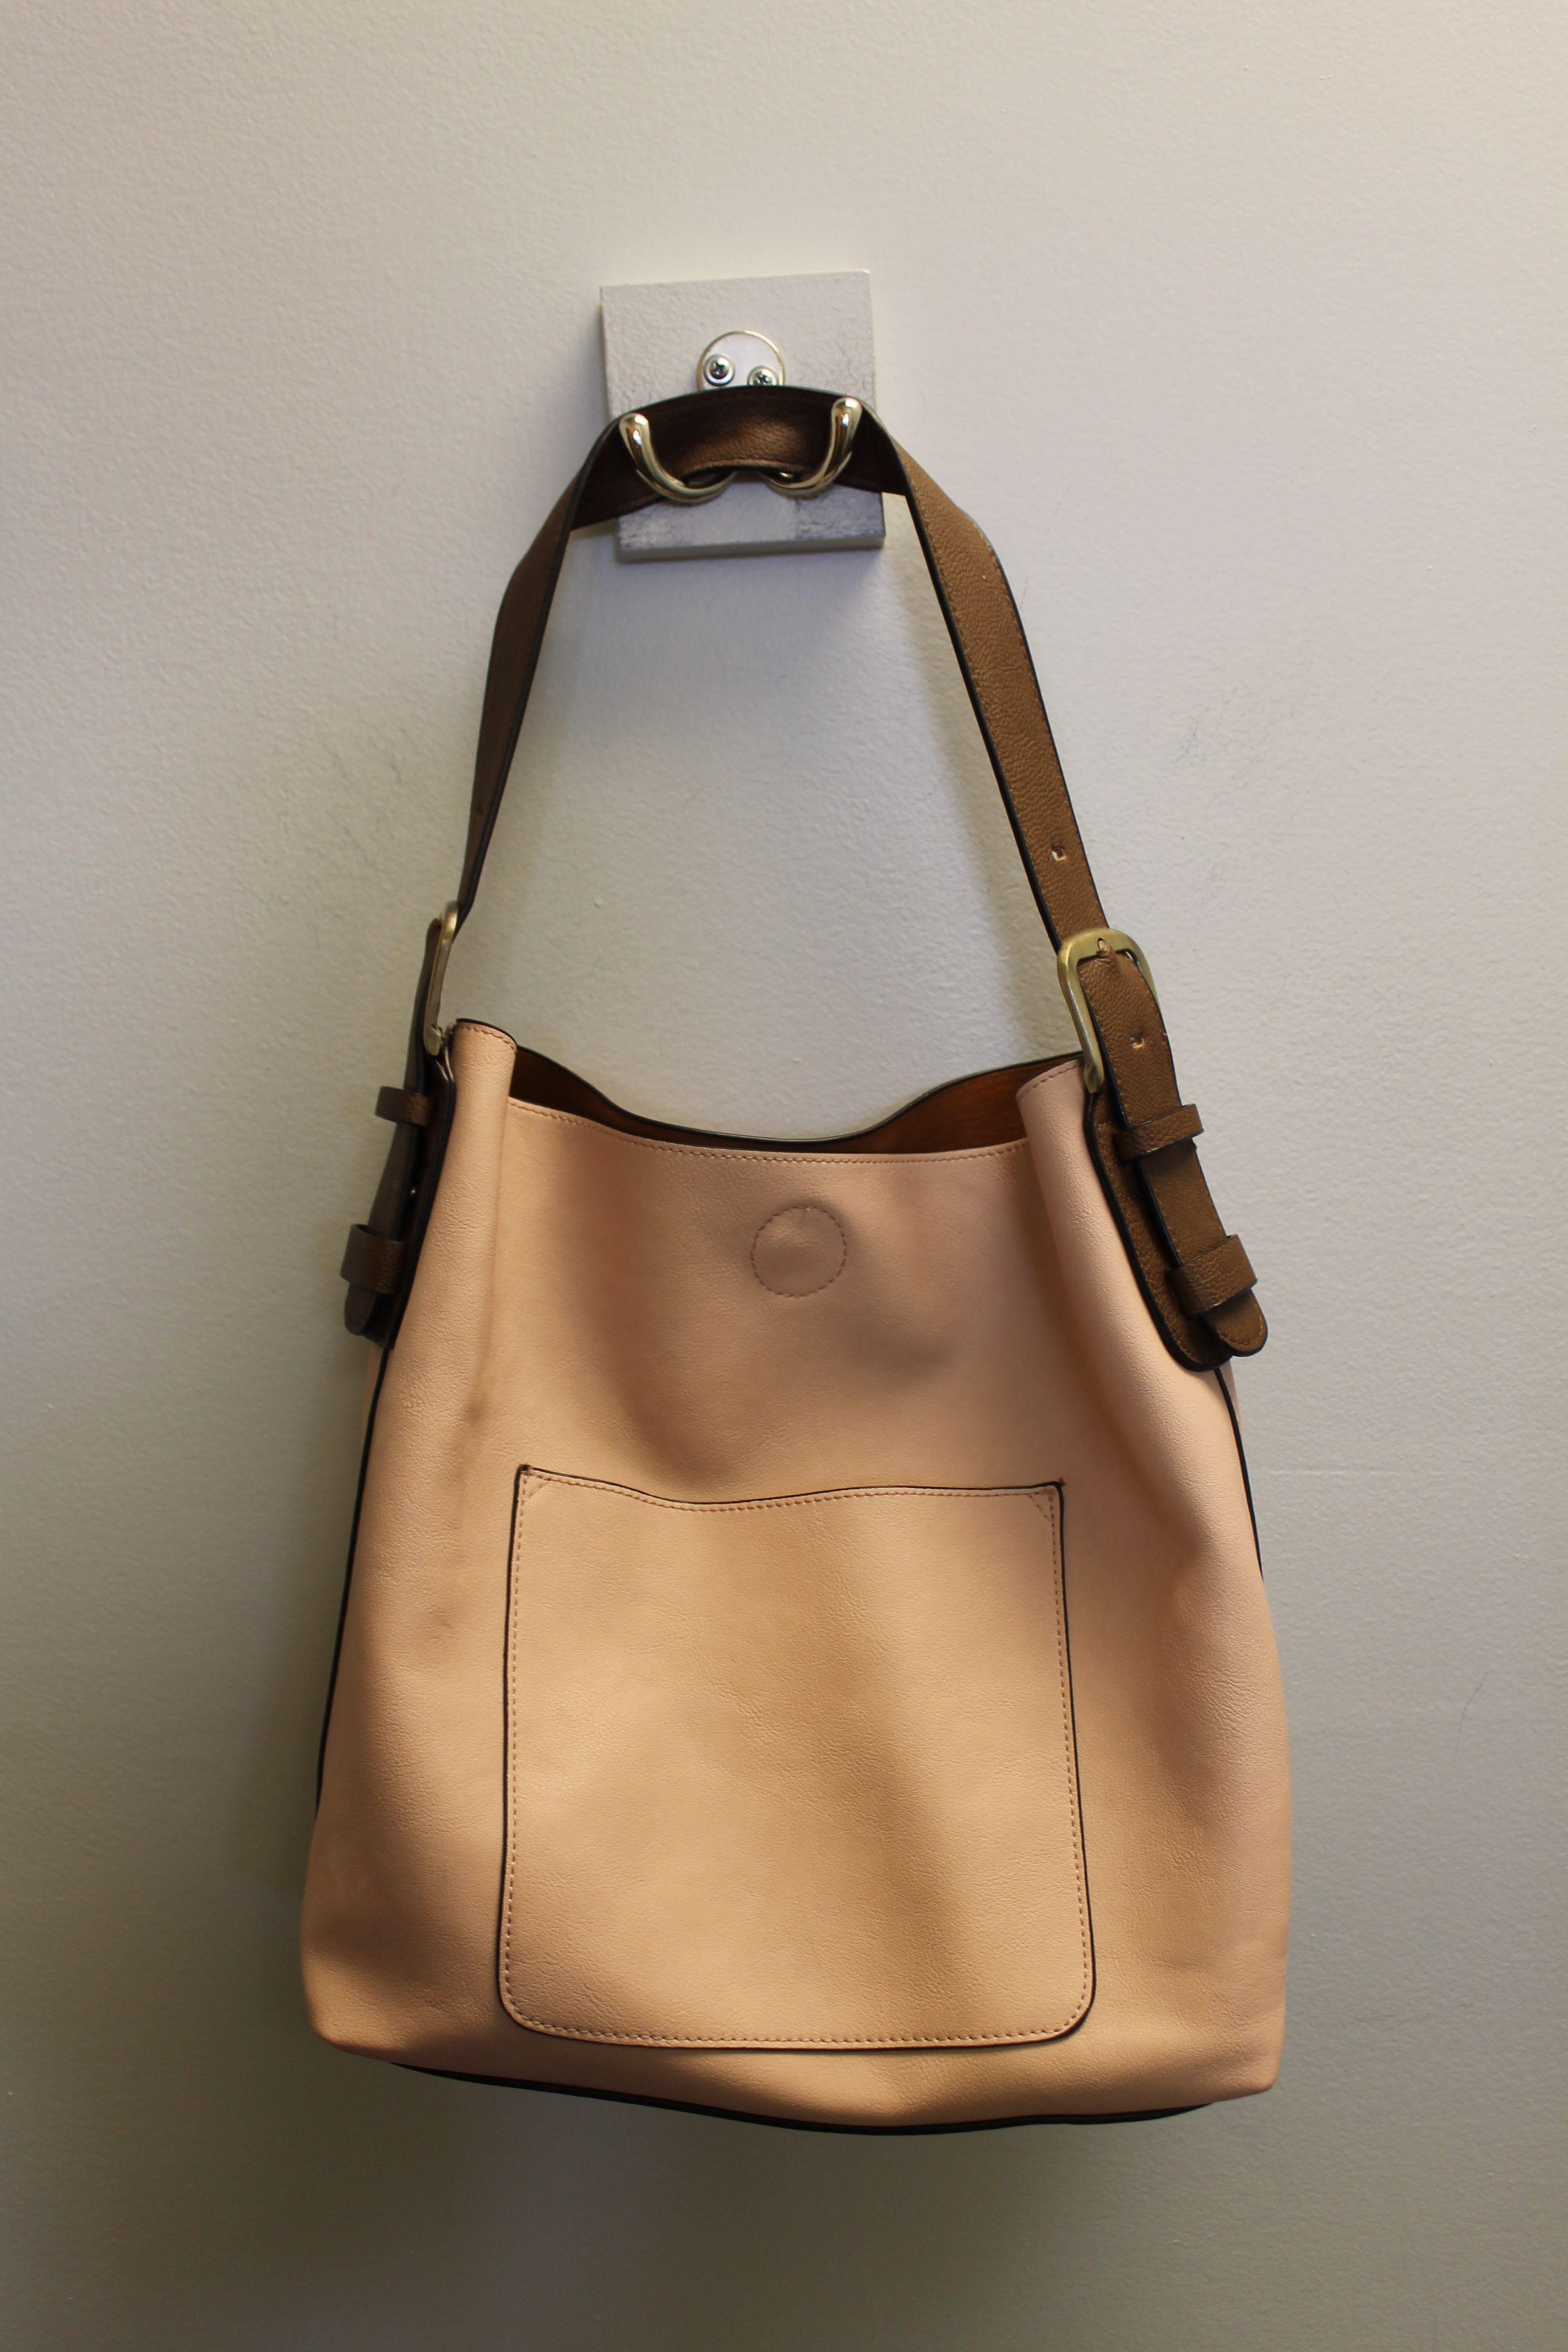 SUSAN-JOY-PALE-PINK-AND-BROWN-Leather-Solid-SHOULDER-BAG_88567B.jpg